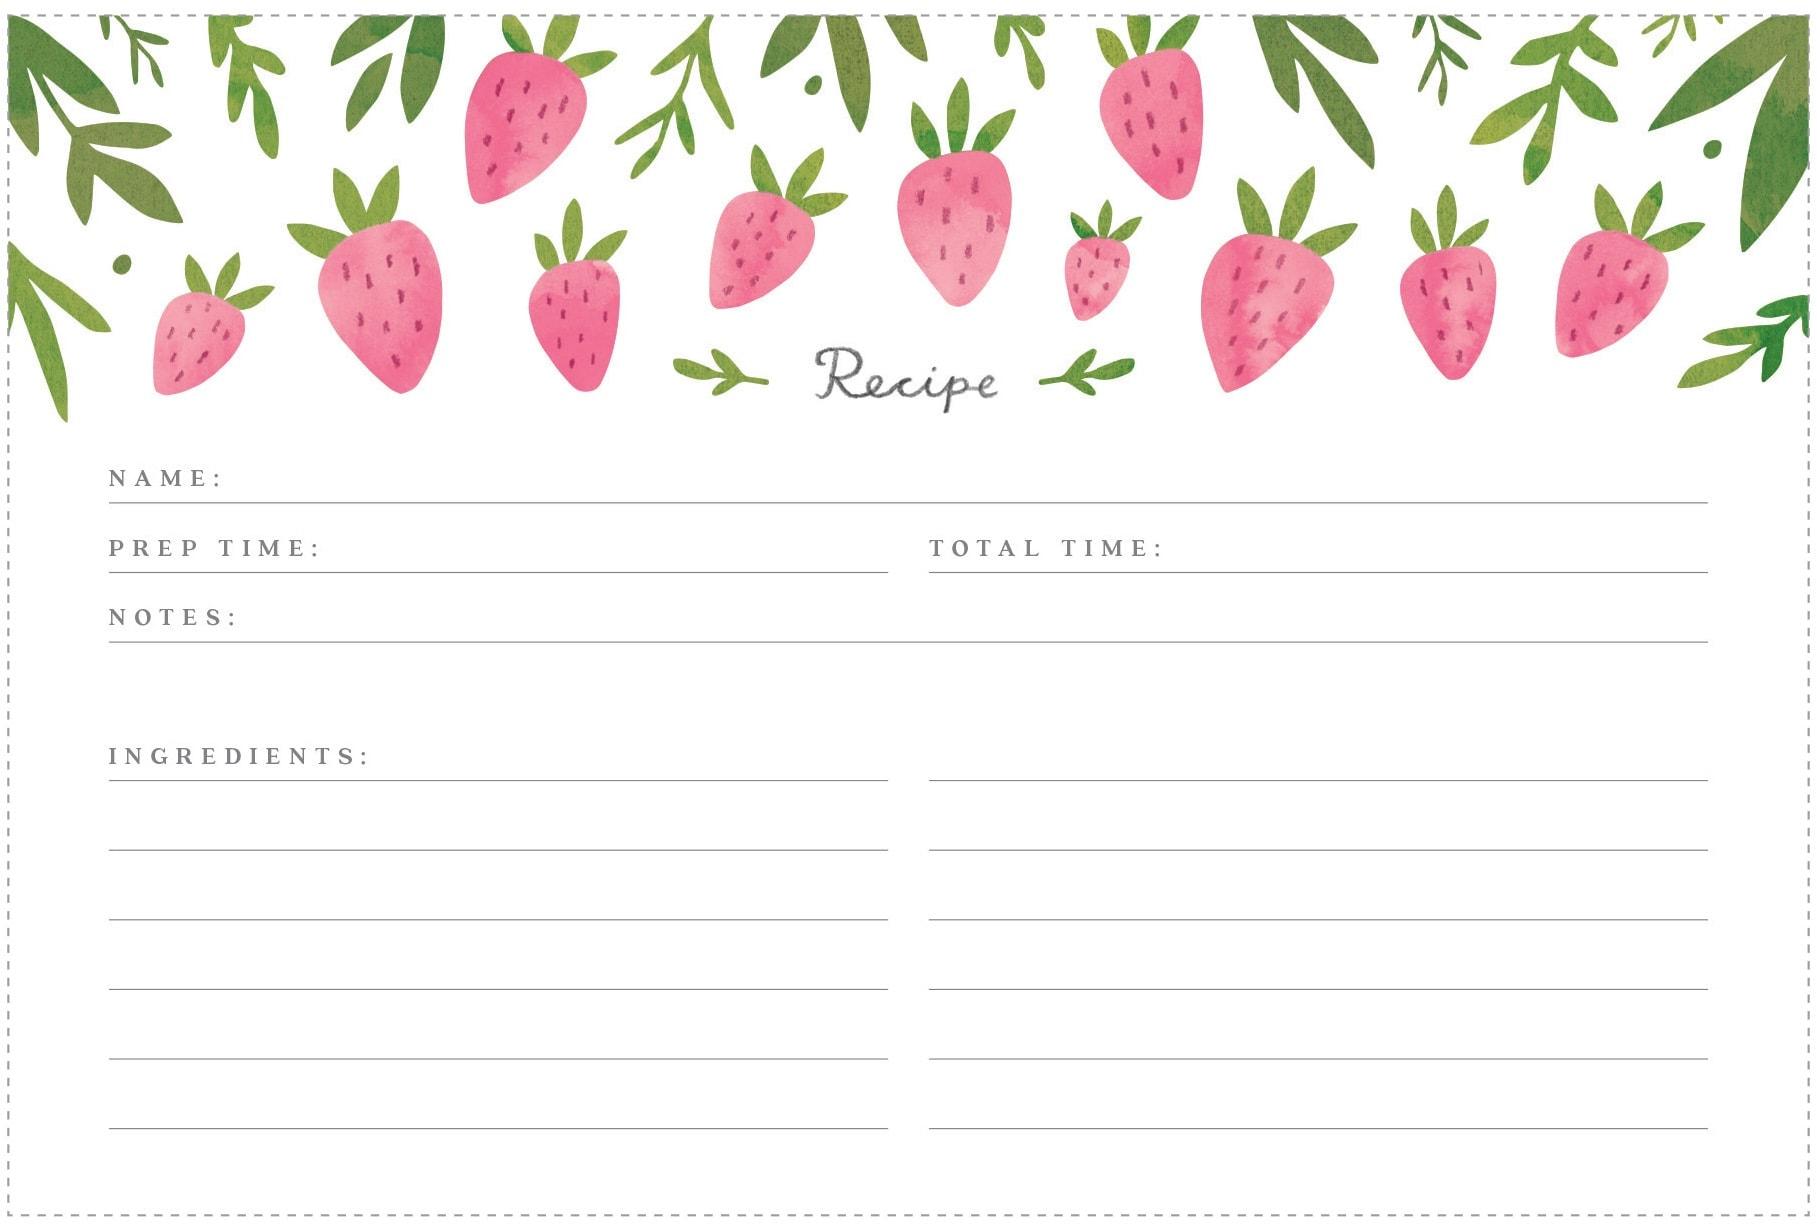 February Printable Recipe Card